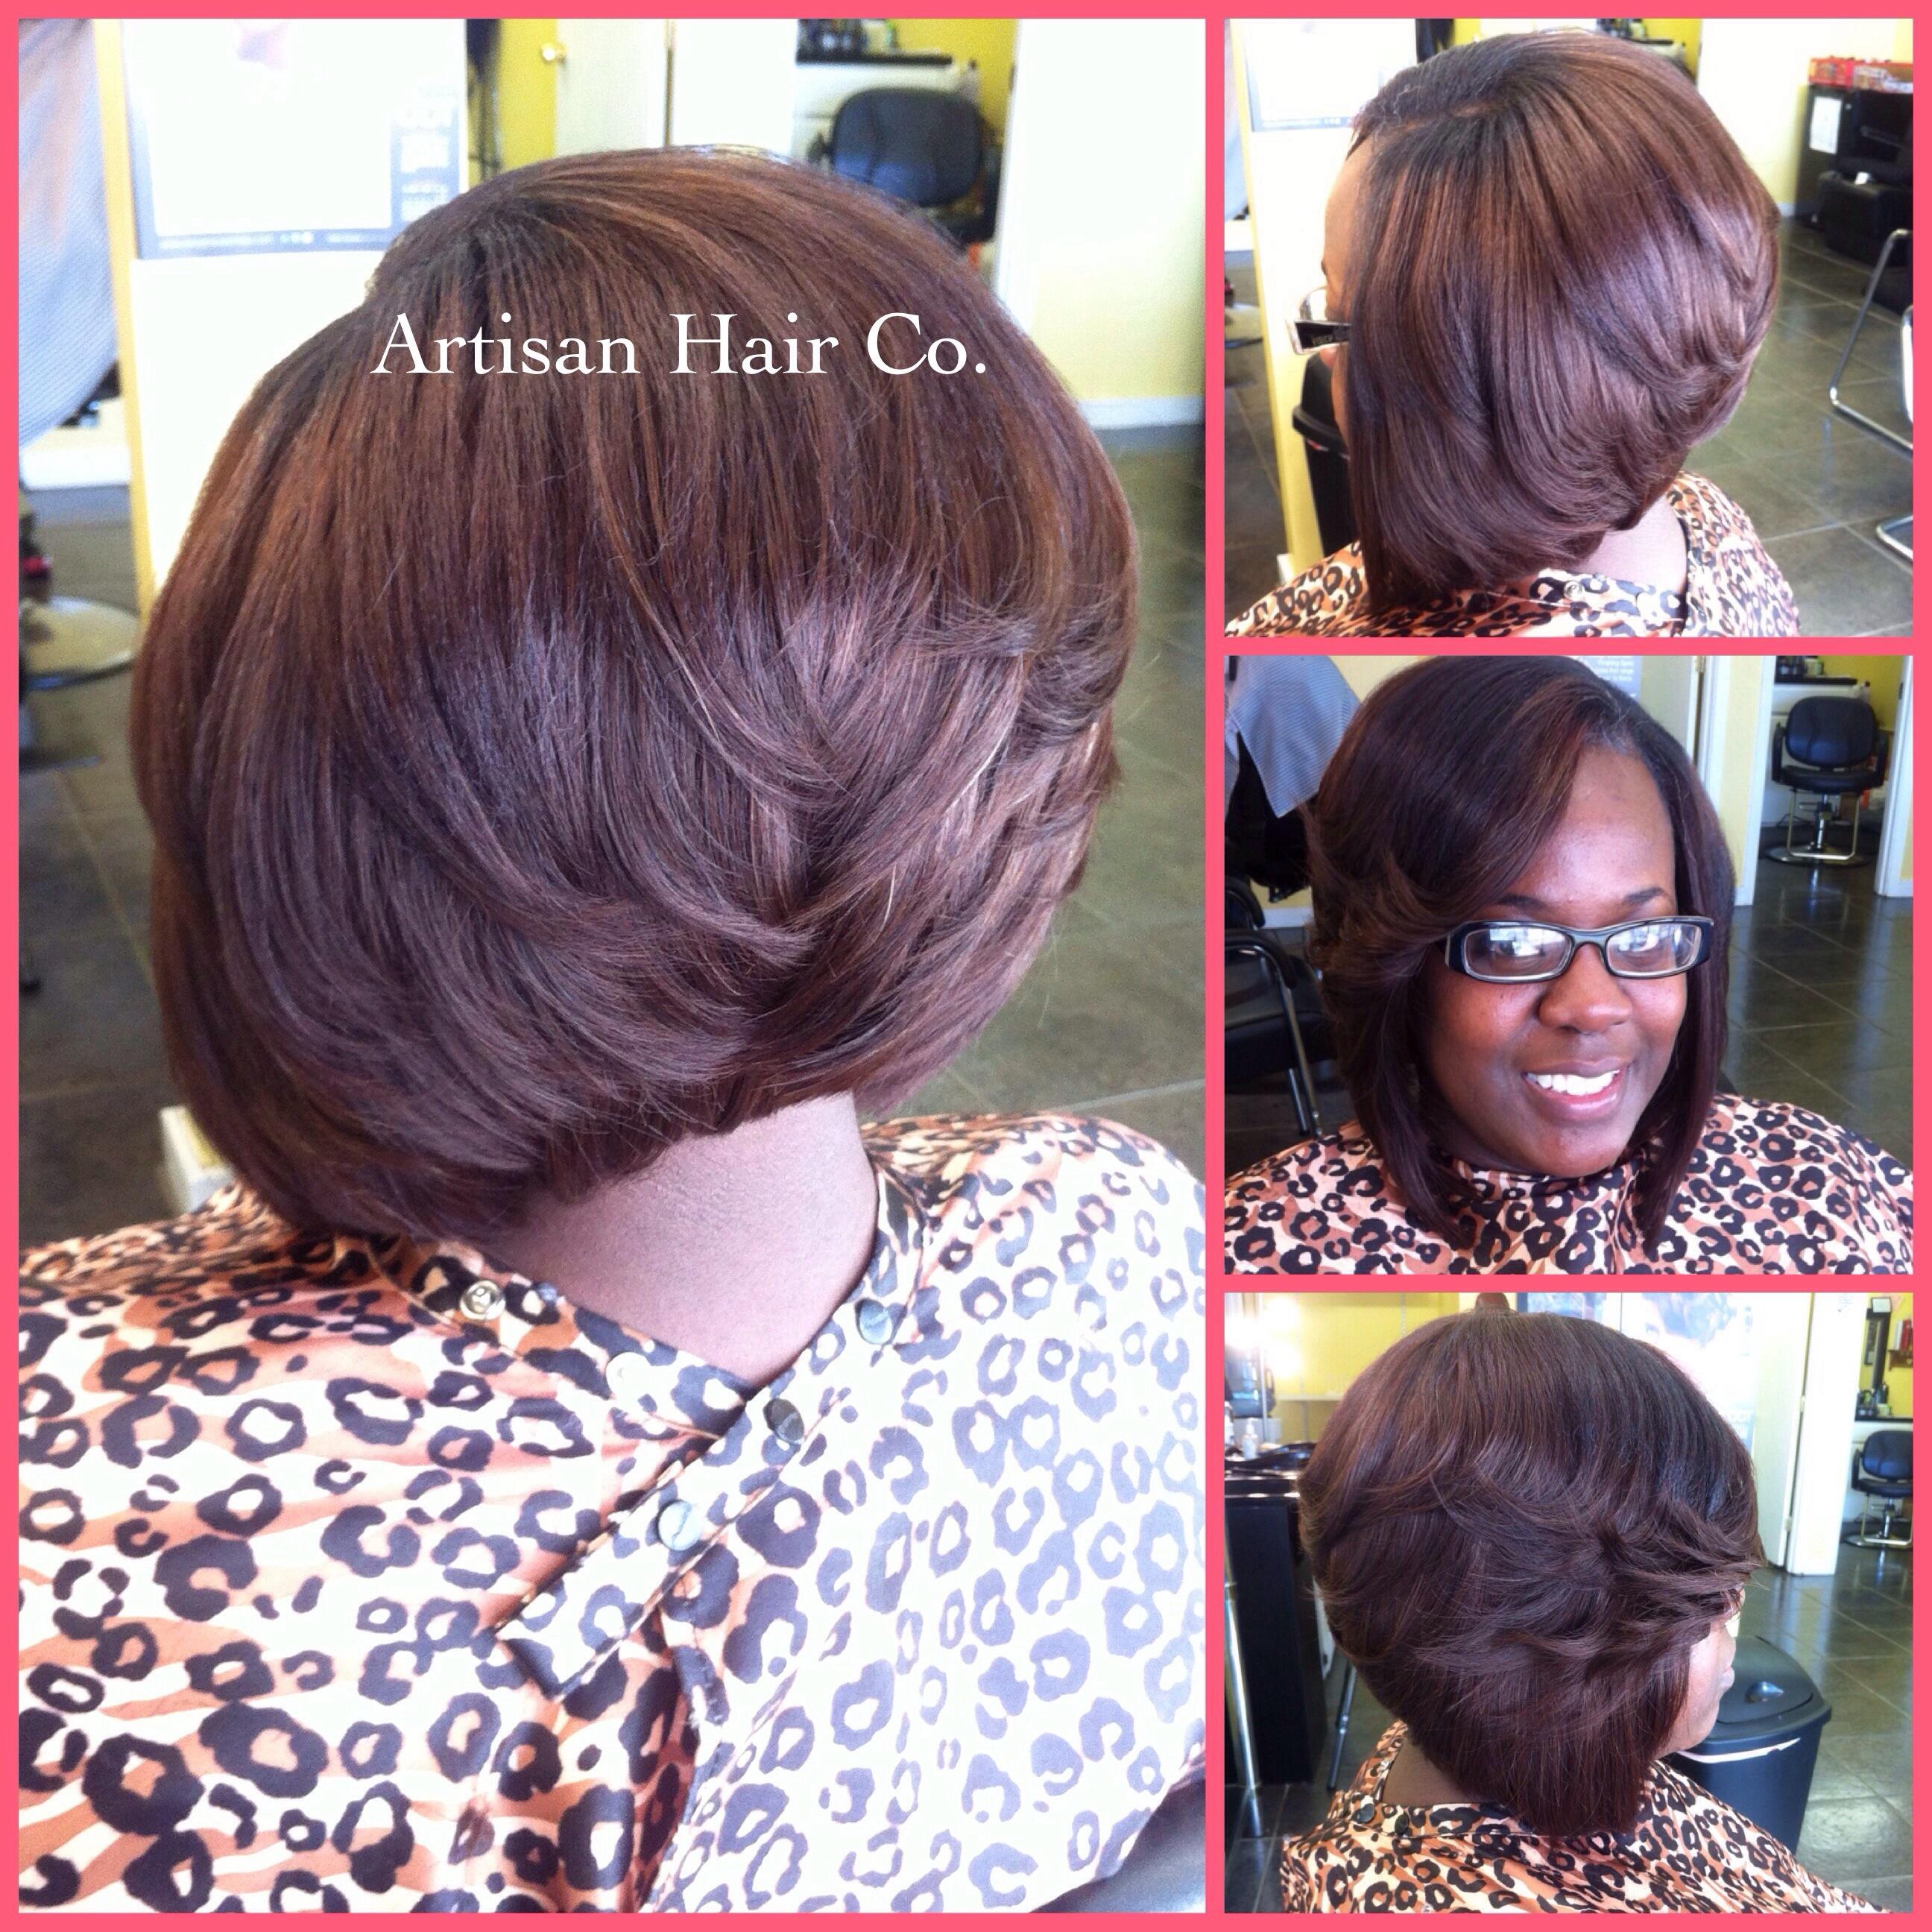 Strange Weave Bob Hairstyles With Side Part Photosgratisylegal Short Hairstyles Gunalazisus